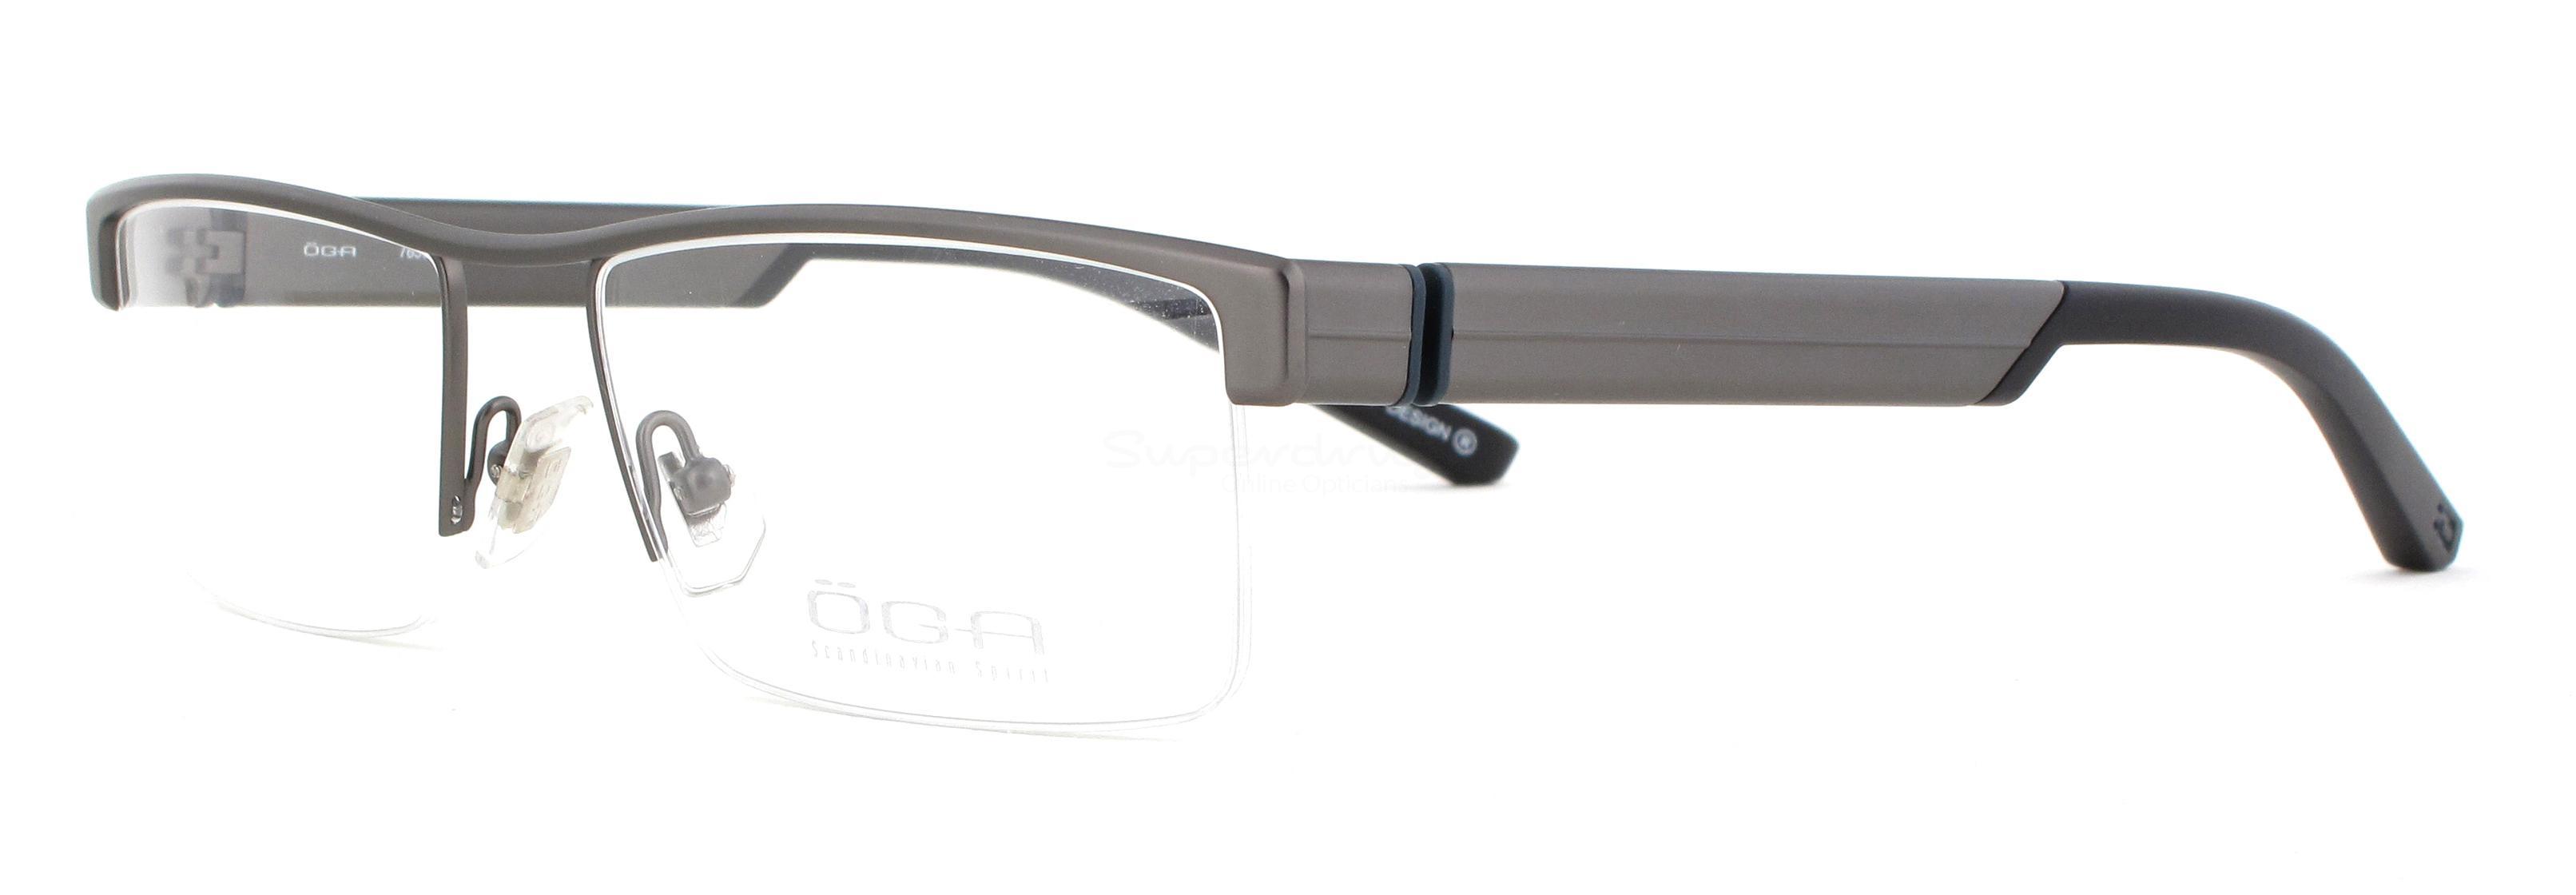 GG111 7659O AVLANG 3 Glasses, ÖGA Scandinavian Spirit